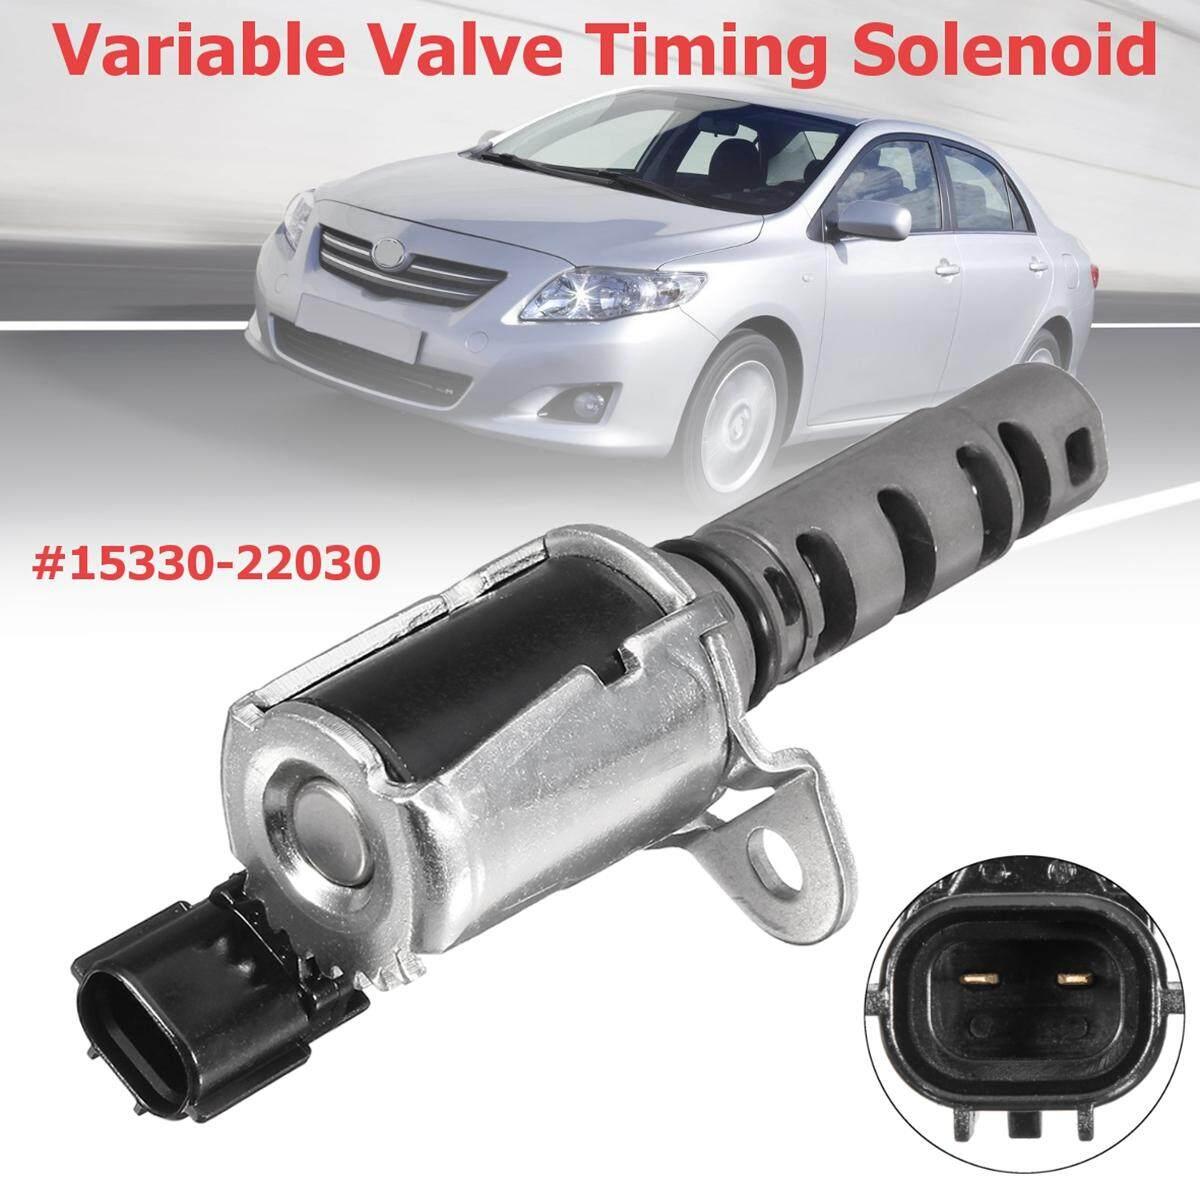 Solenoids for sale - Car Solenoids online brands, prices & reviews